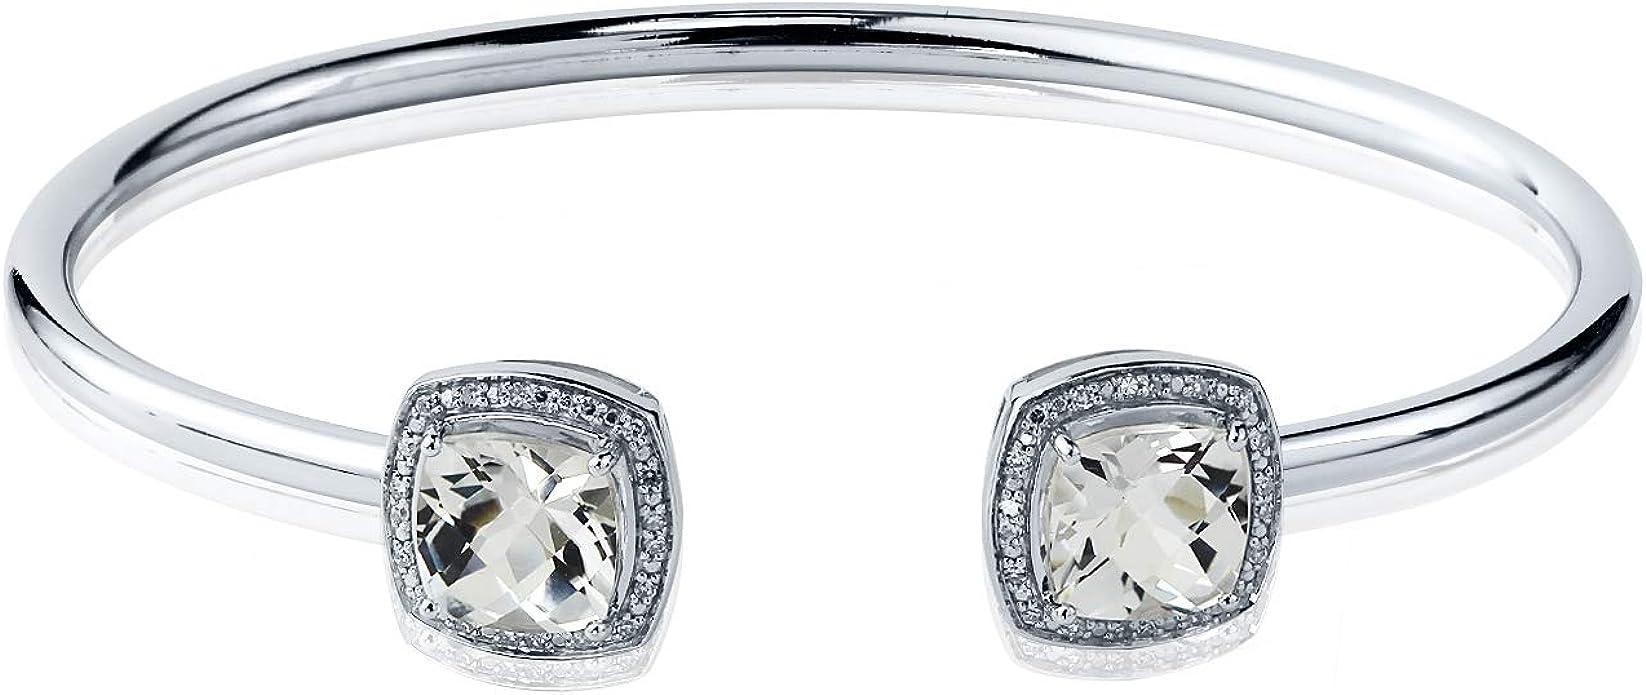 Amazon Com Sterling Silver Cushion Cut White Topaz And Halo Diamond Cuff Bangle Bracelet 5ct Tgw By Diamond Wish Jewelry